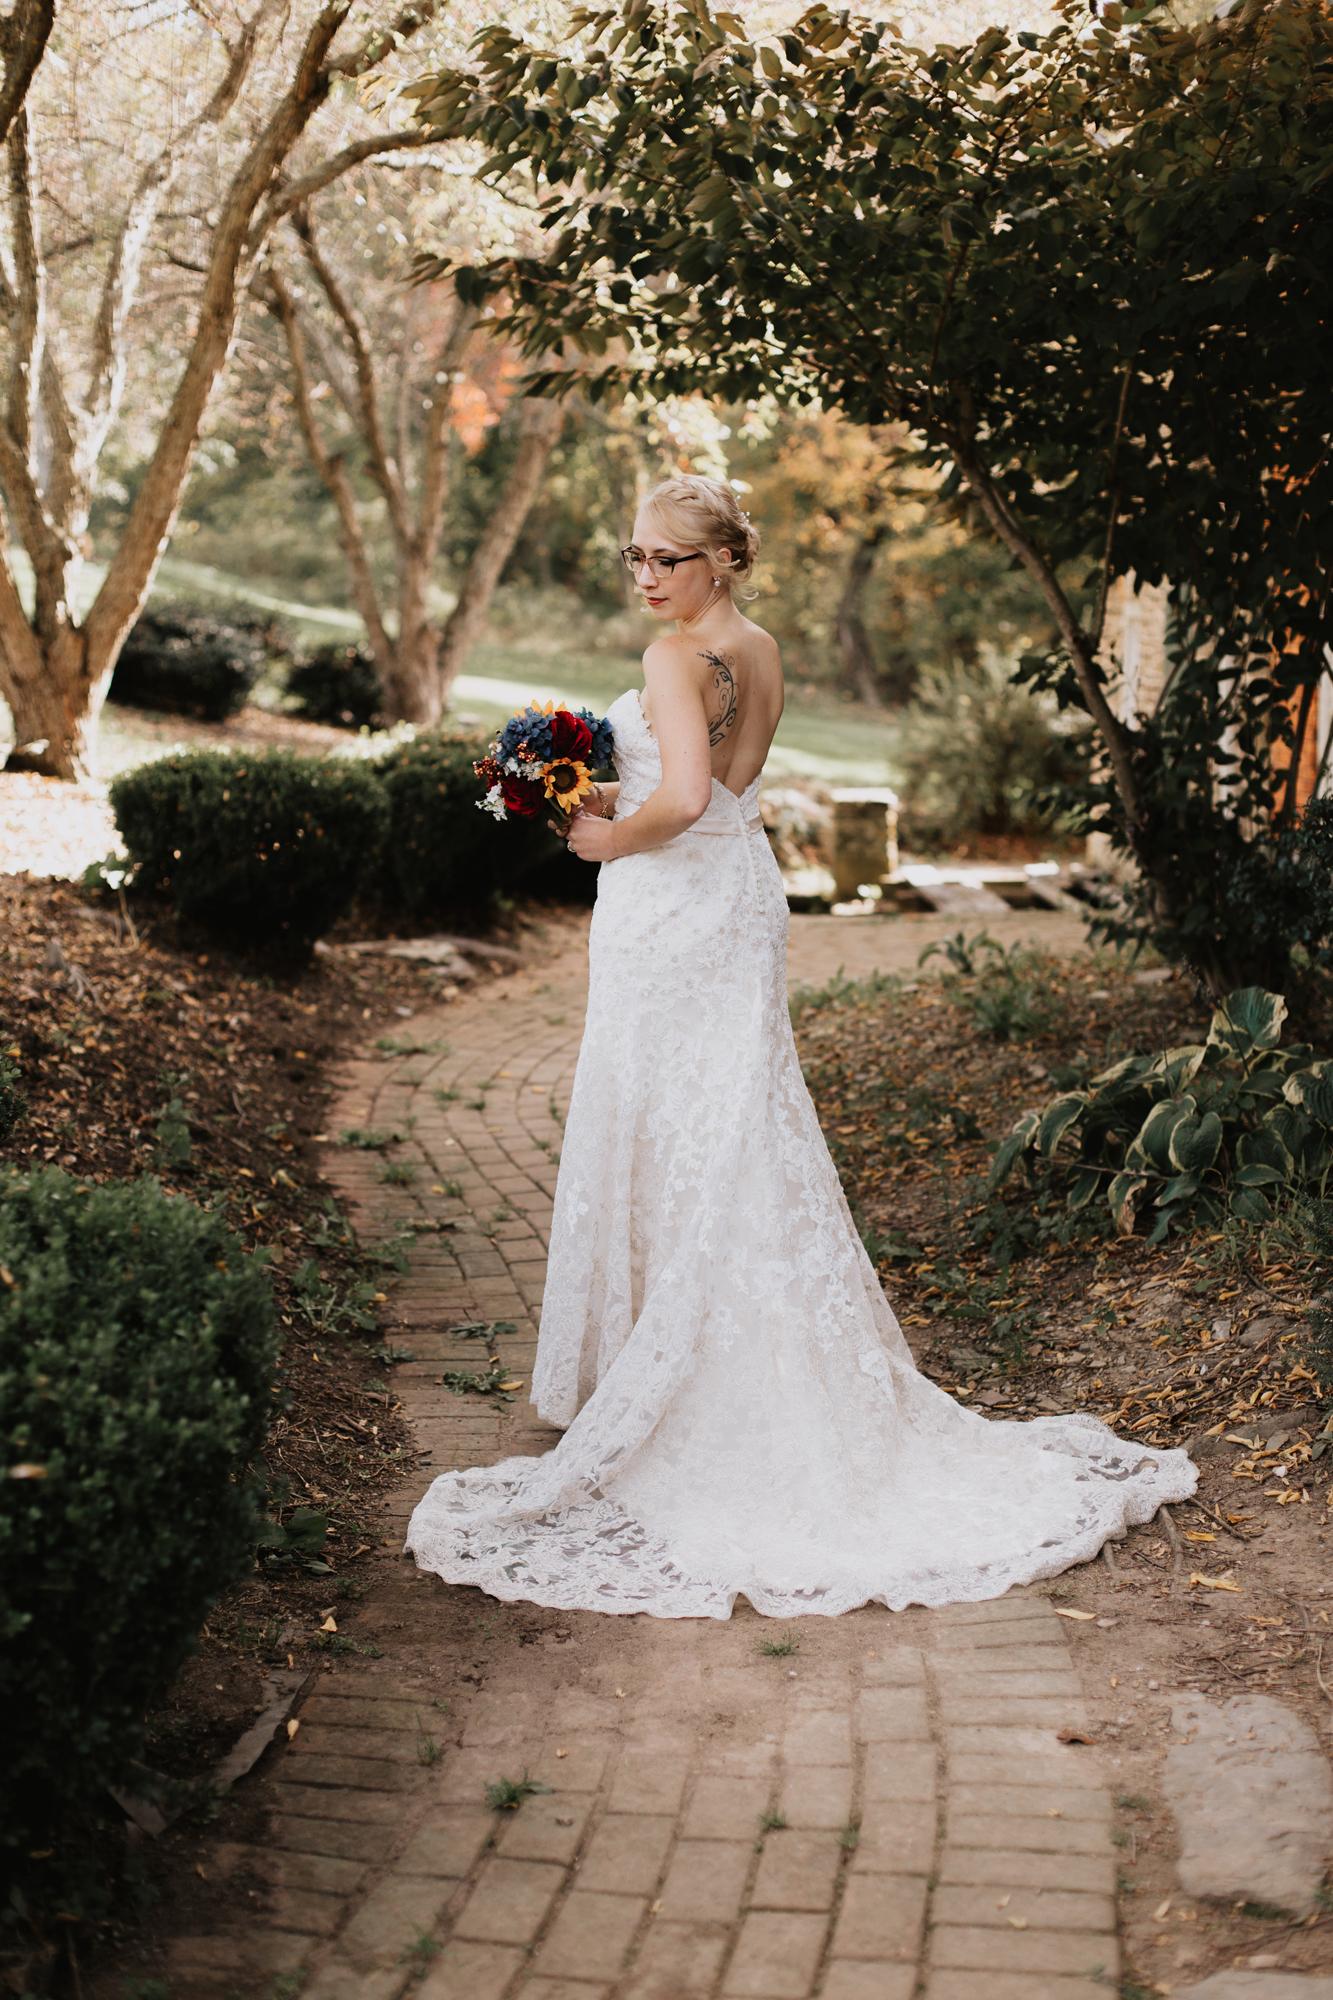 beautiful-bride-portrait-wedding-day-photography-lehigh-valley-pa